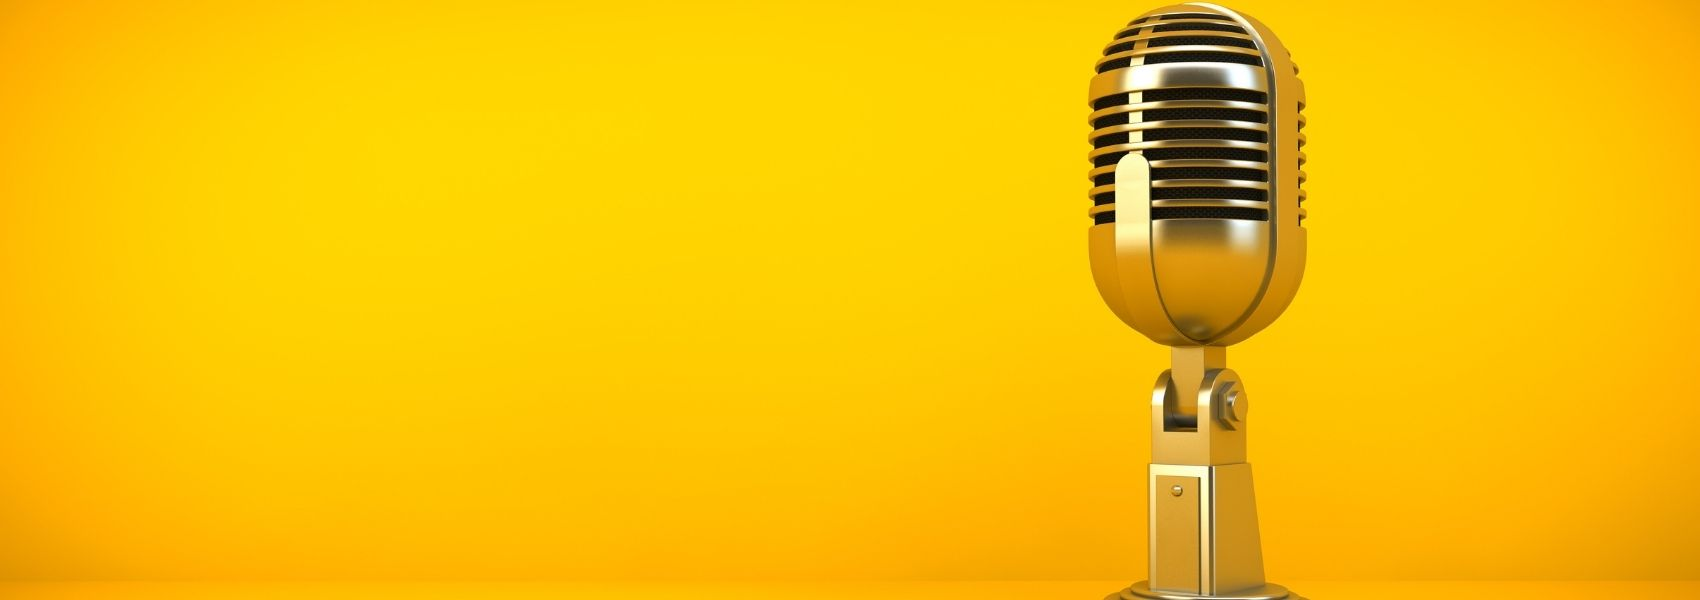 Podcast 'Oncologia no Ar' pretende aumentar a literacia na área da oncologia